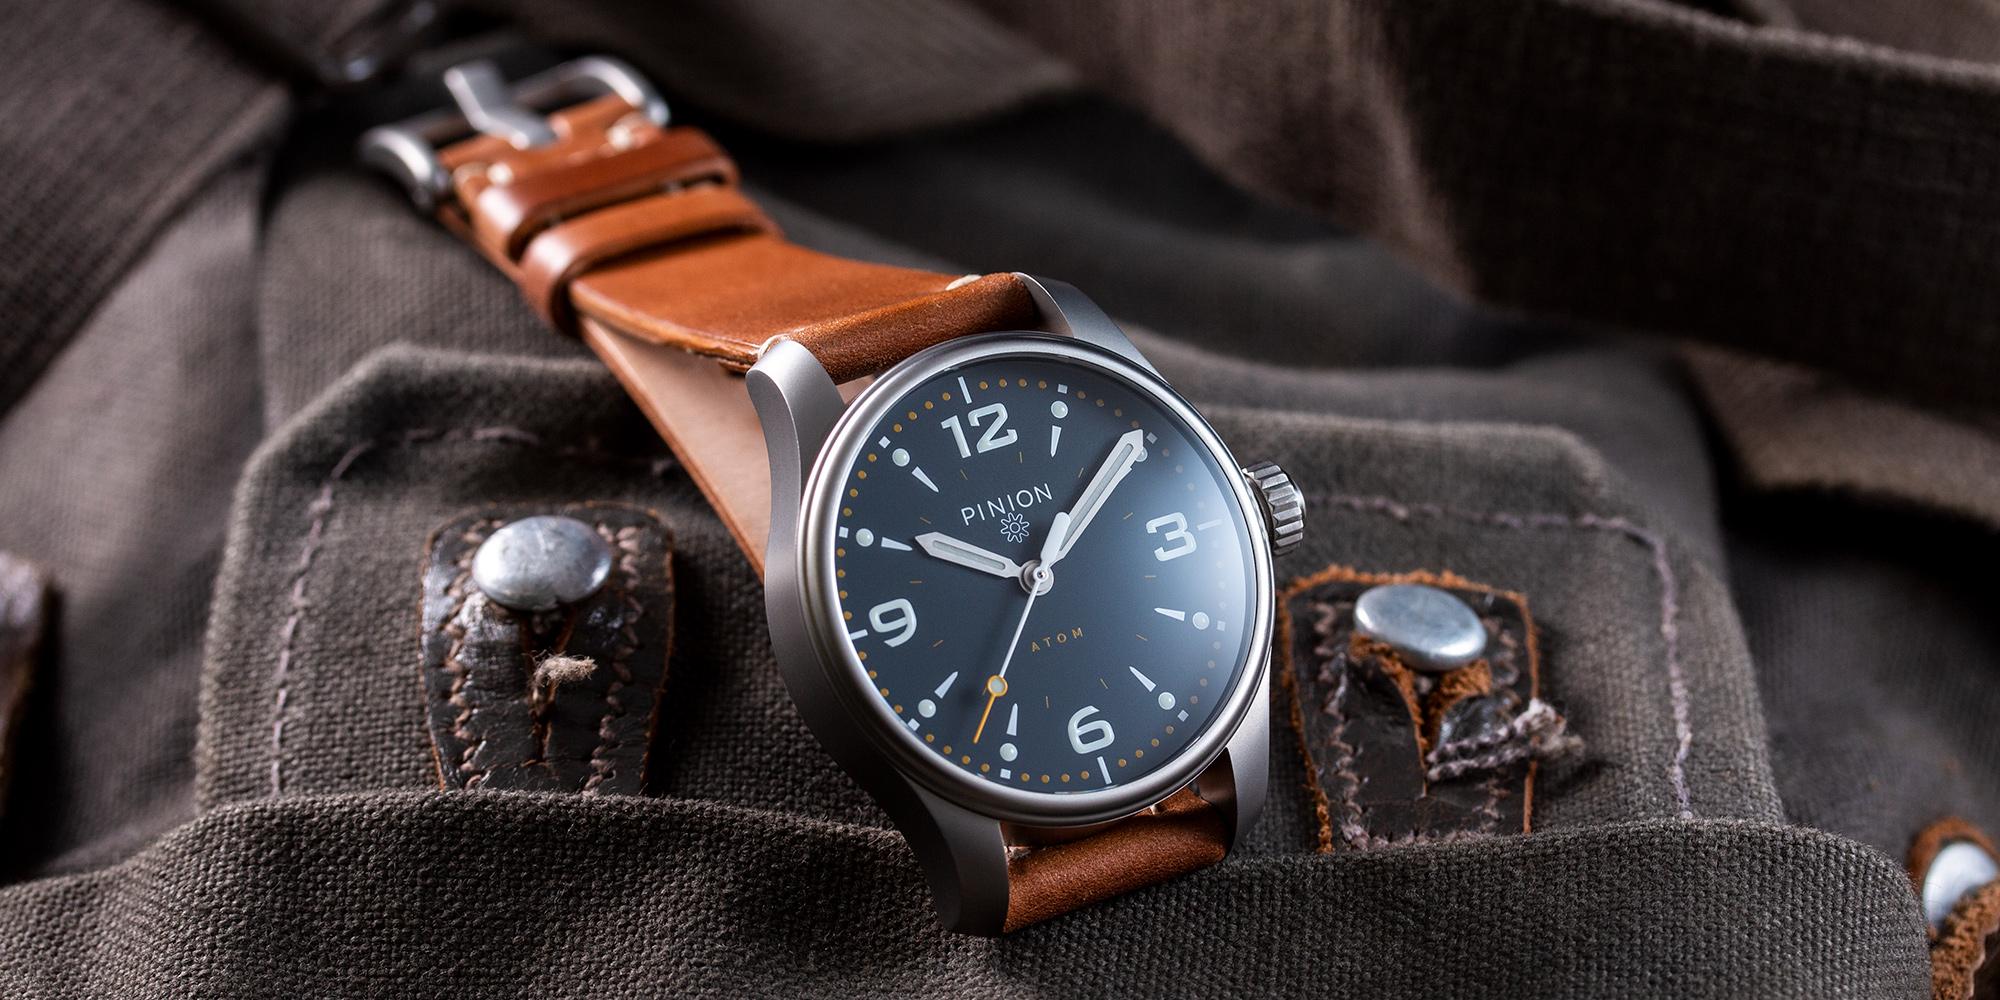 Pinion-Atom-39-no-date-watch-oxford-blue-011-a